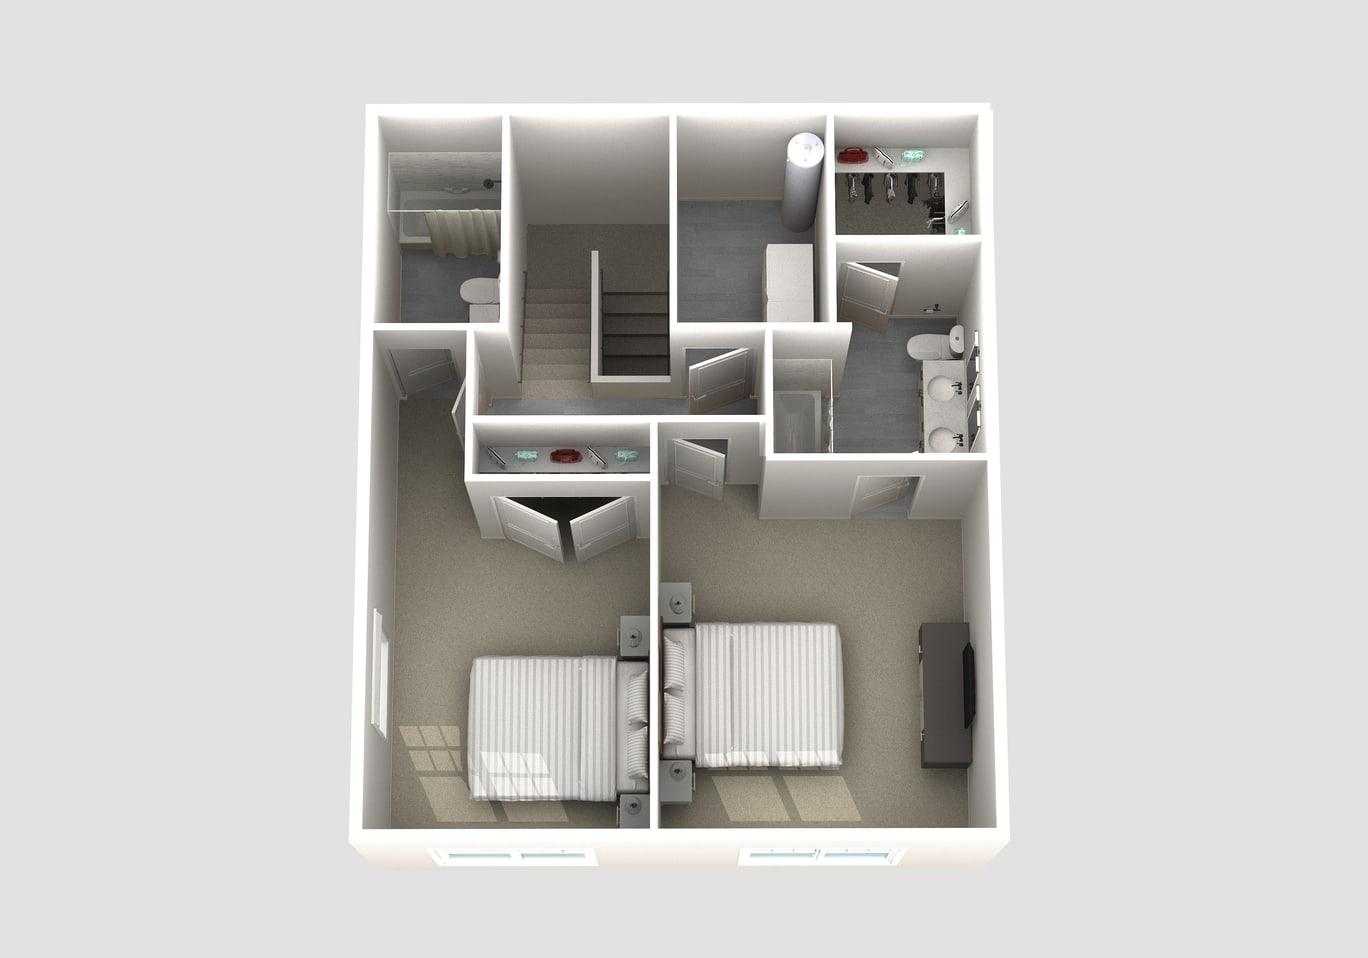 The Hamilton floor plan second floor